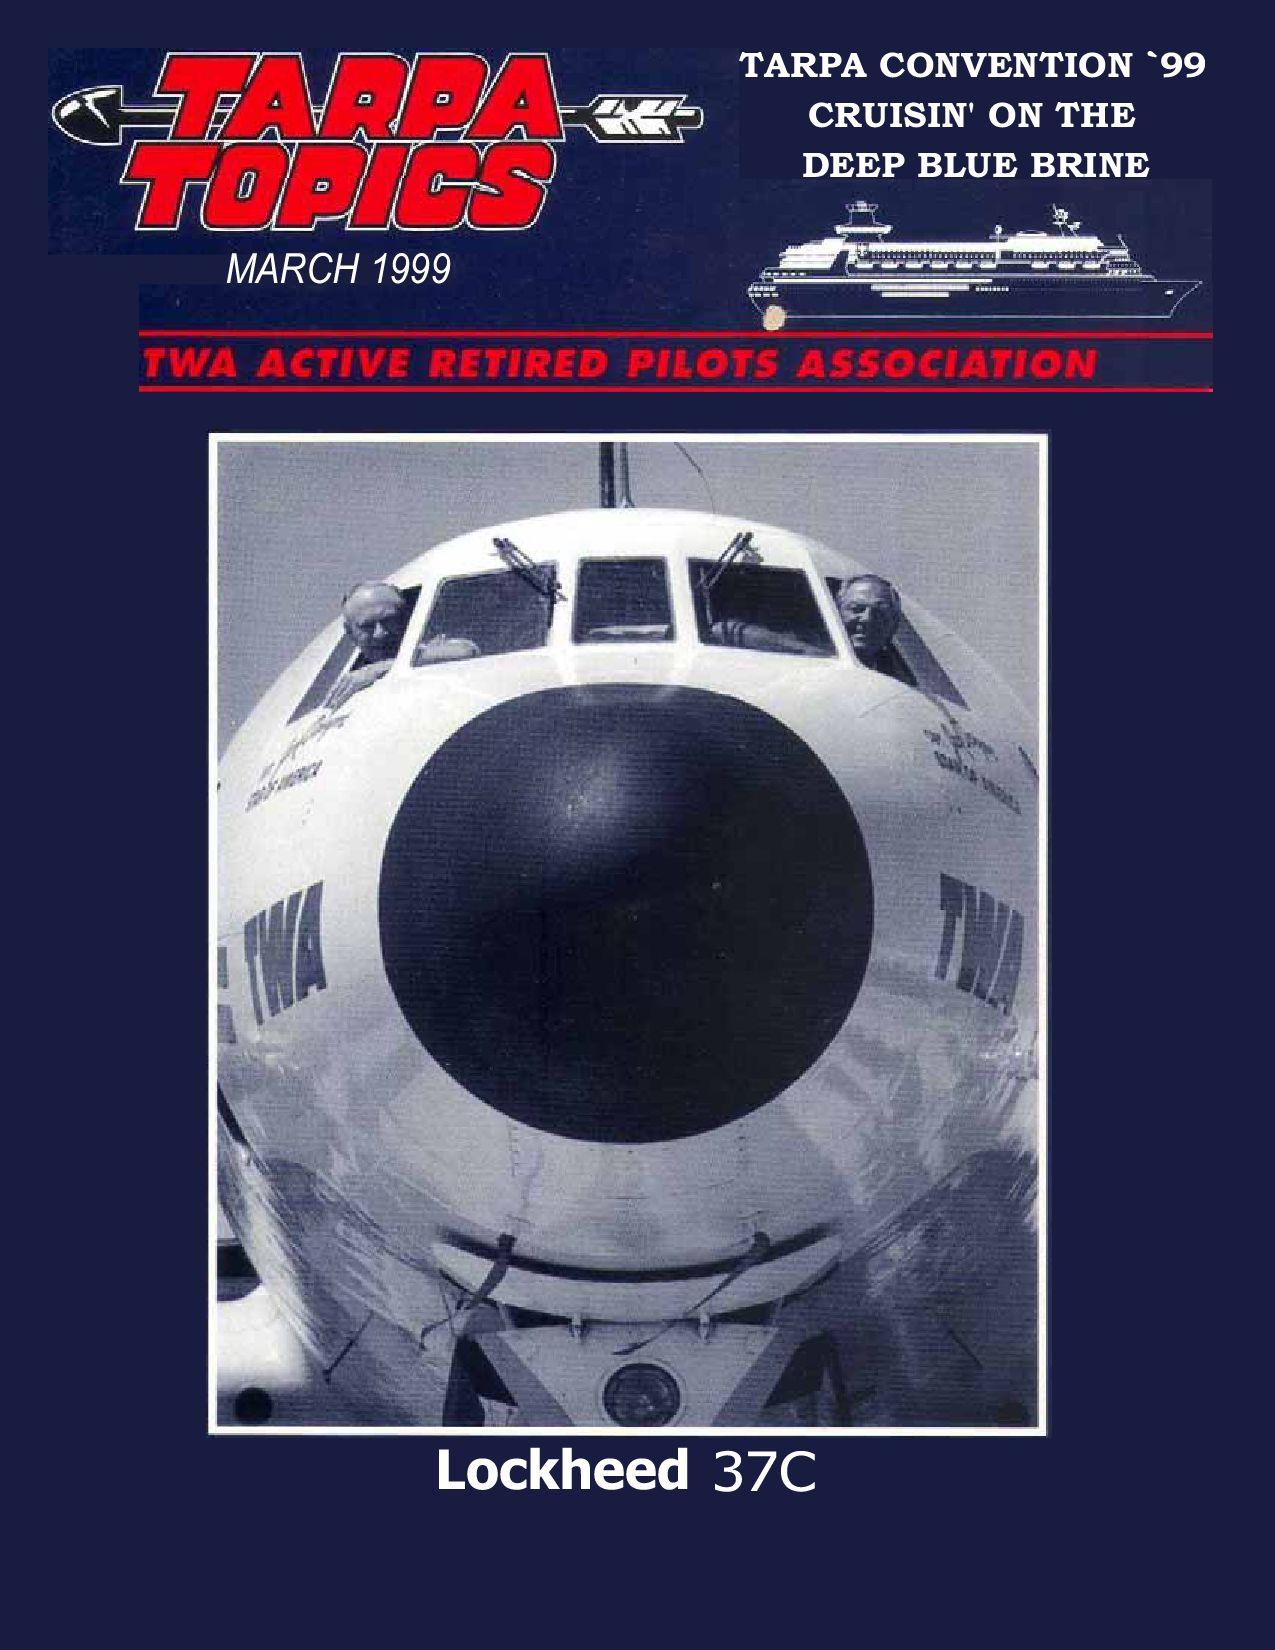 1983 TWA AIRLINES 747 JET AMBASSADOR CLASS Vintage Look REPLICA METAL SIGN